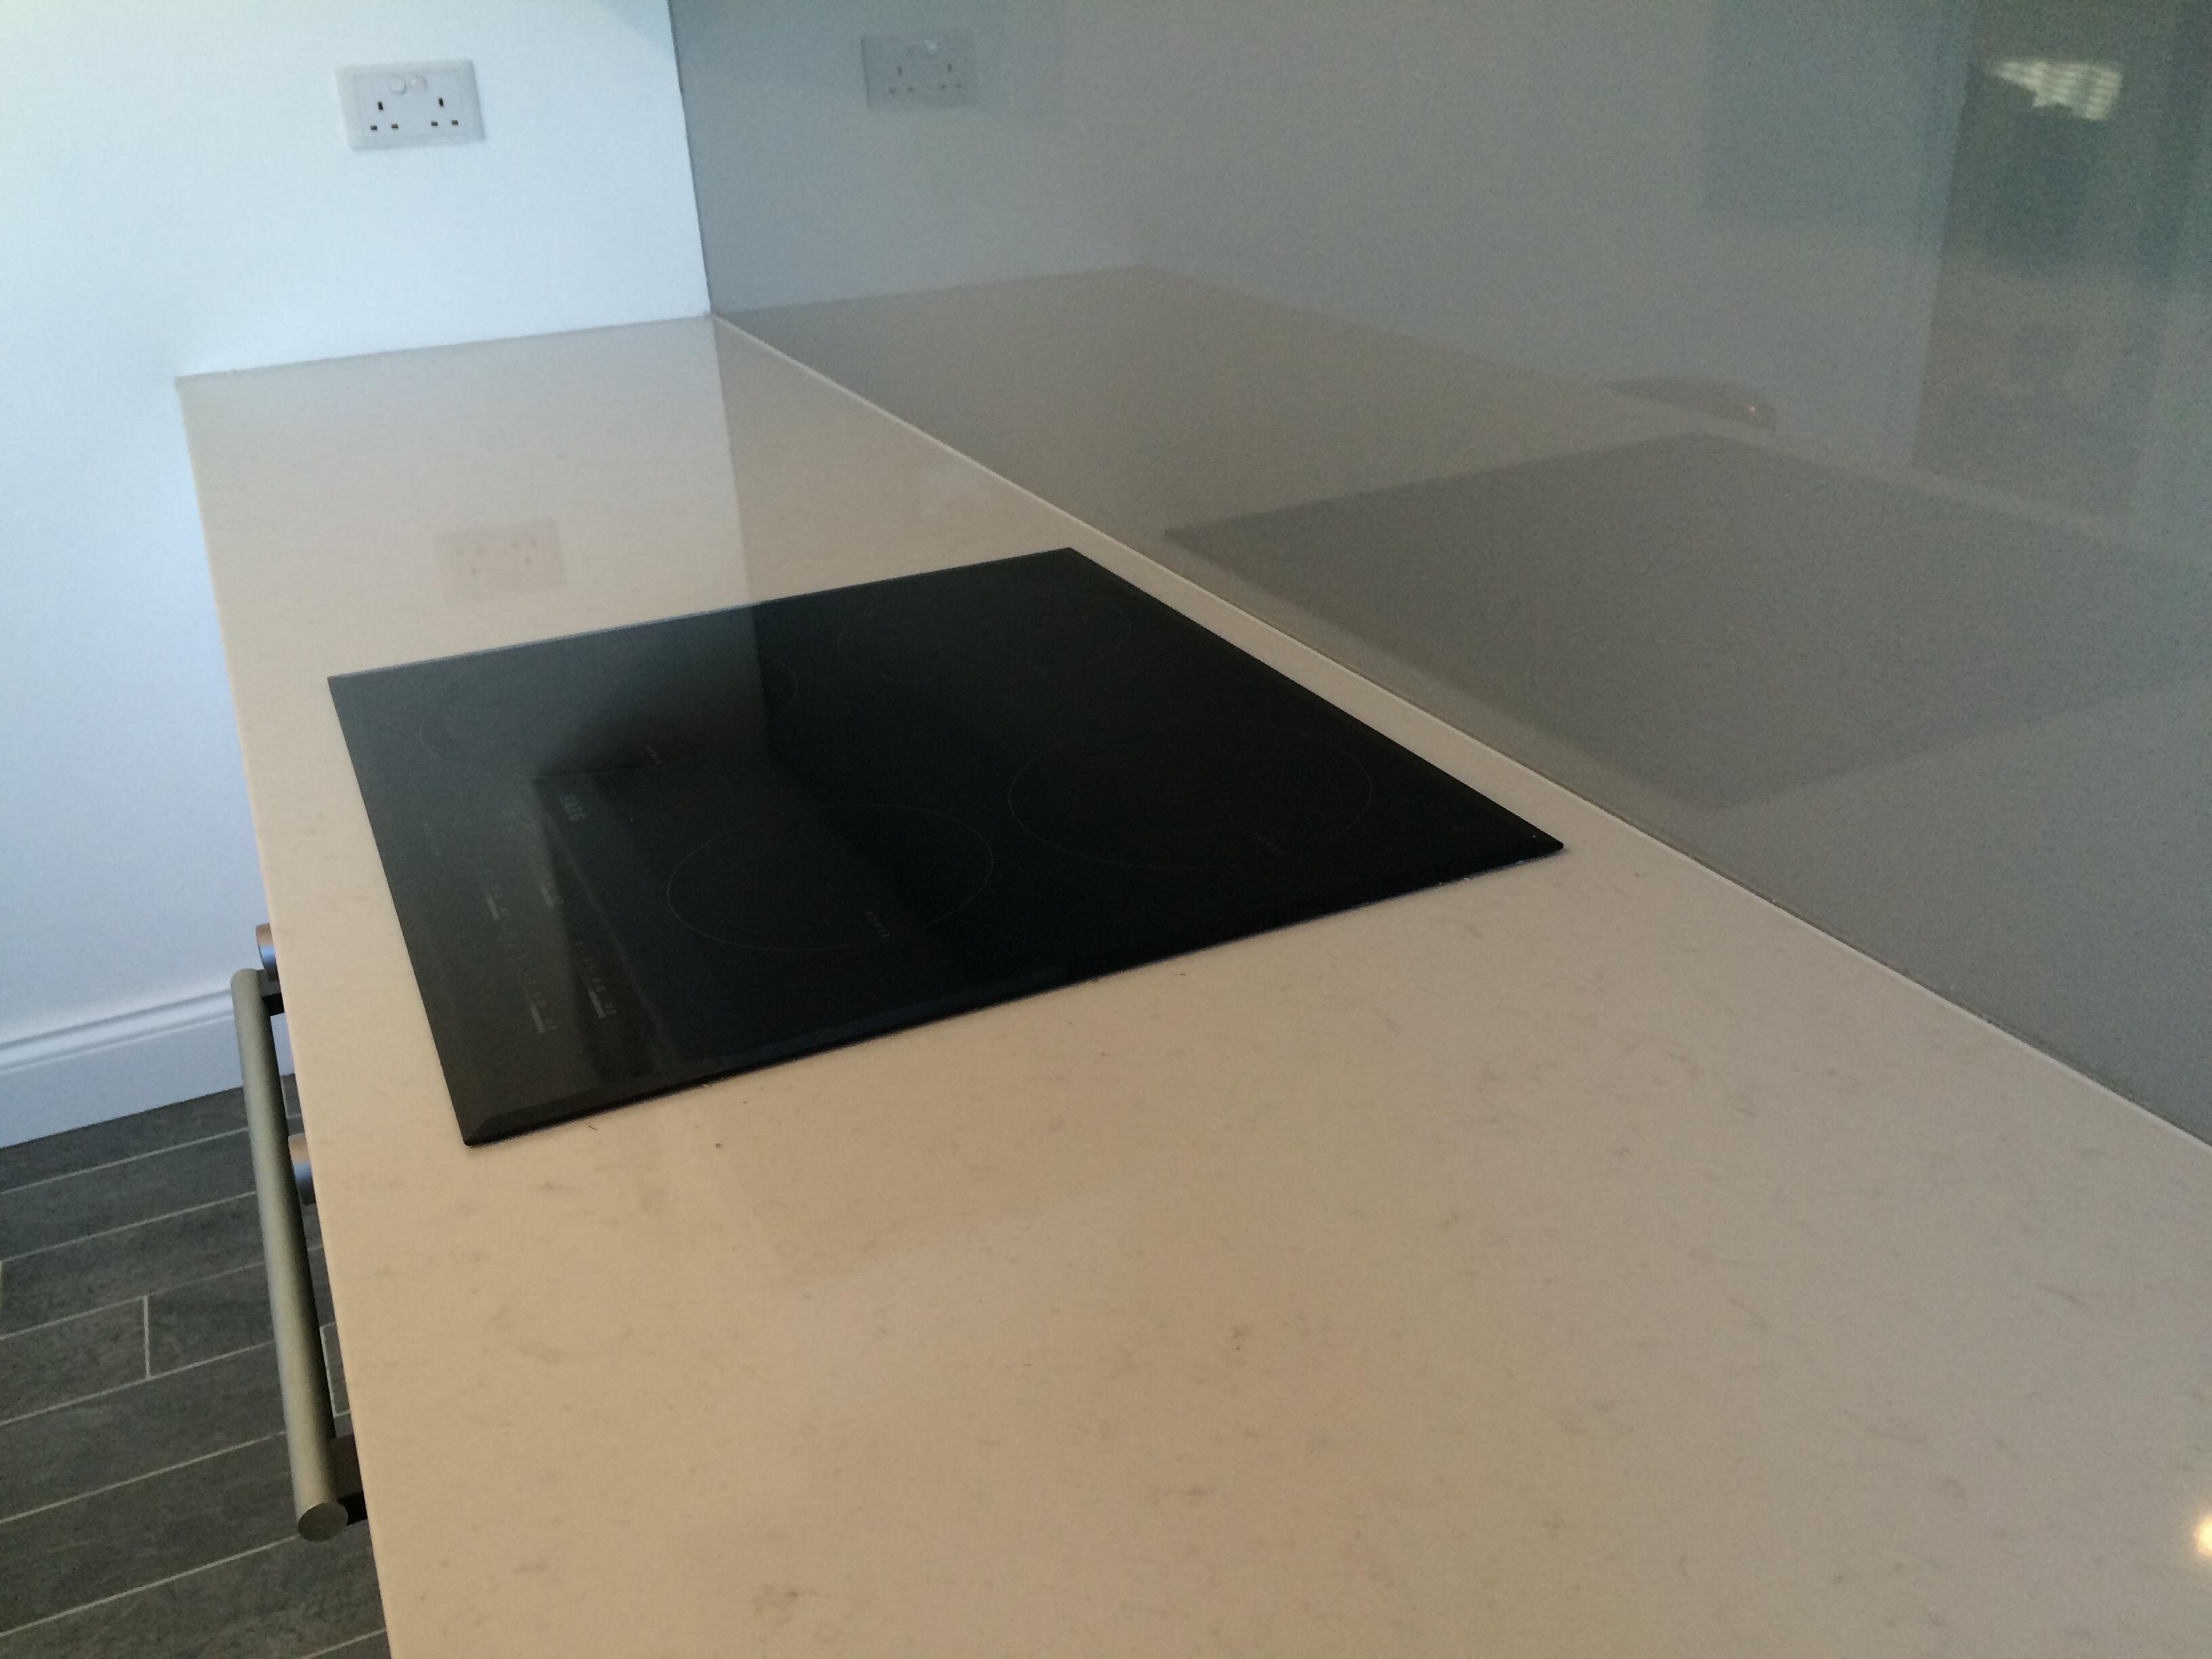 Marble look quartz kitchen wokrtop in N1 London and glass splashback(1)